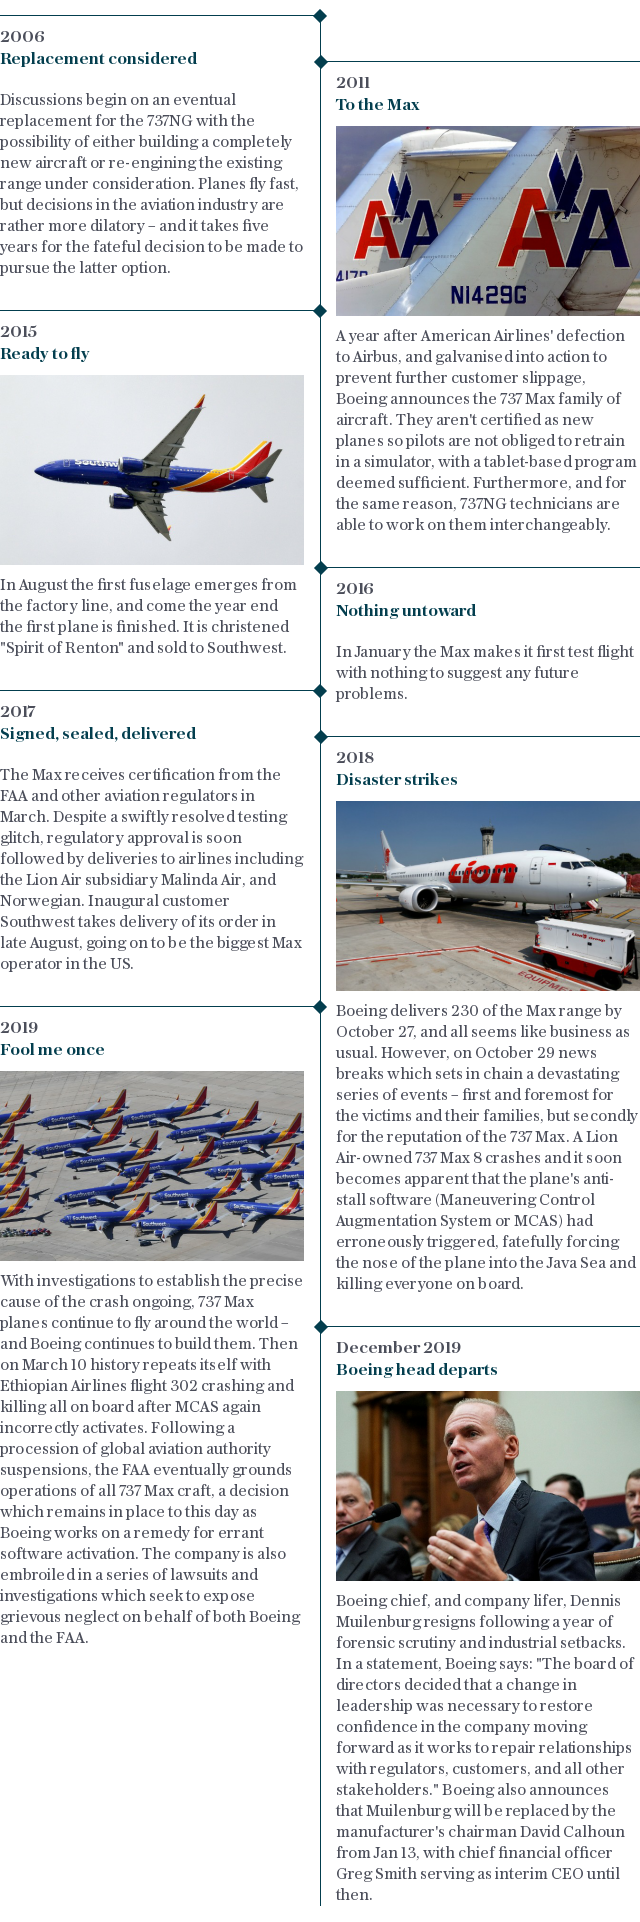 Timeline | Boeing 737 Max